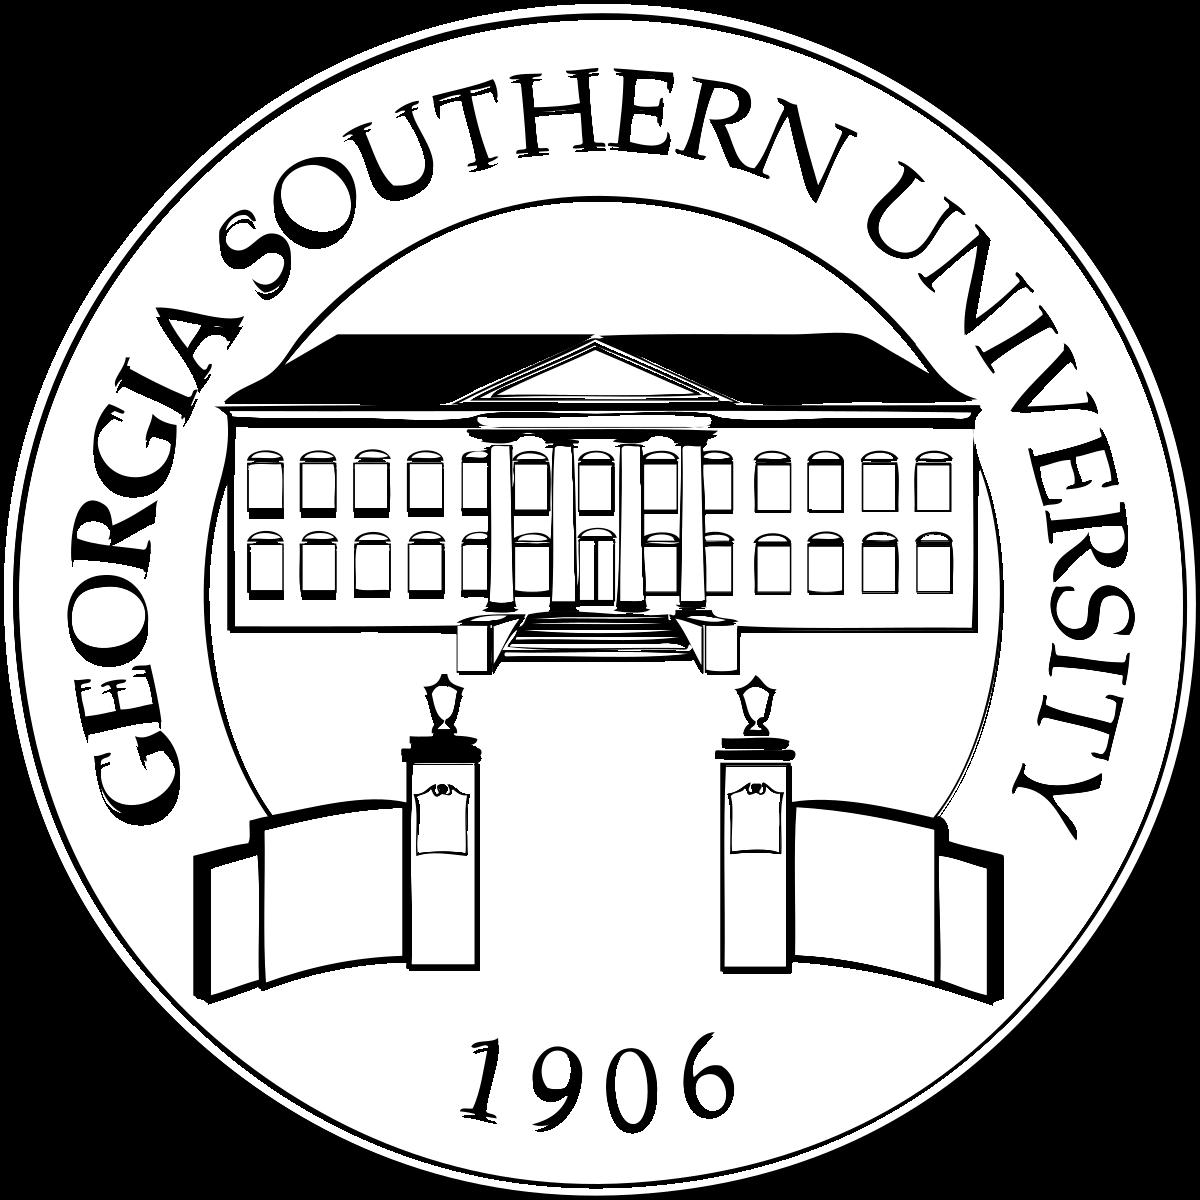 Georgia Southern University.